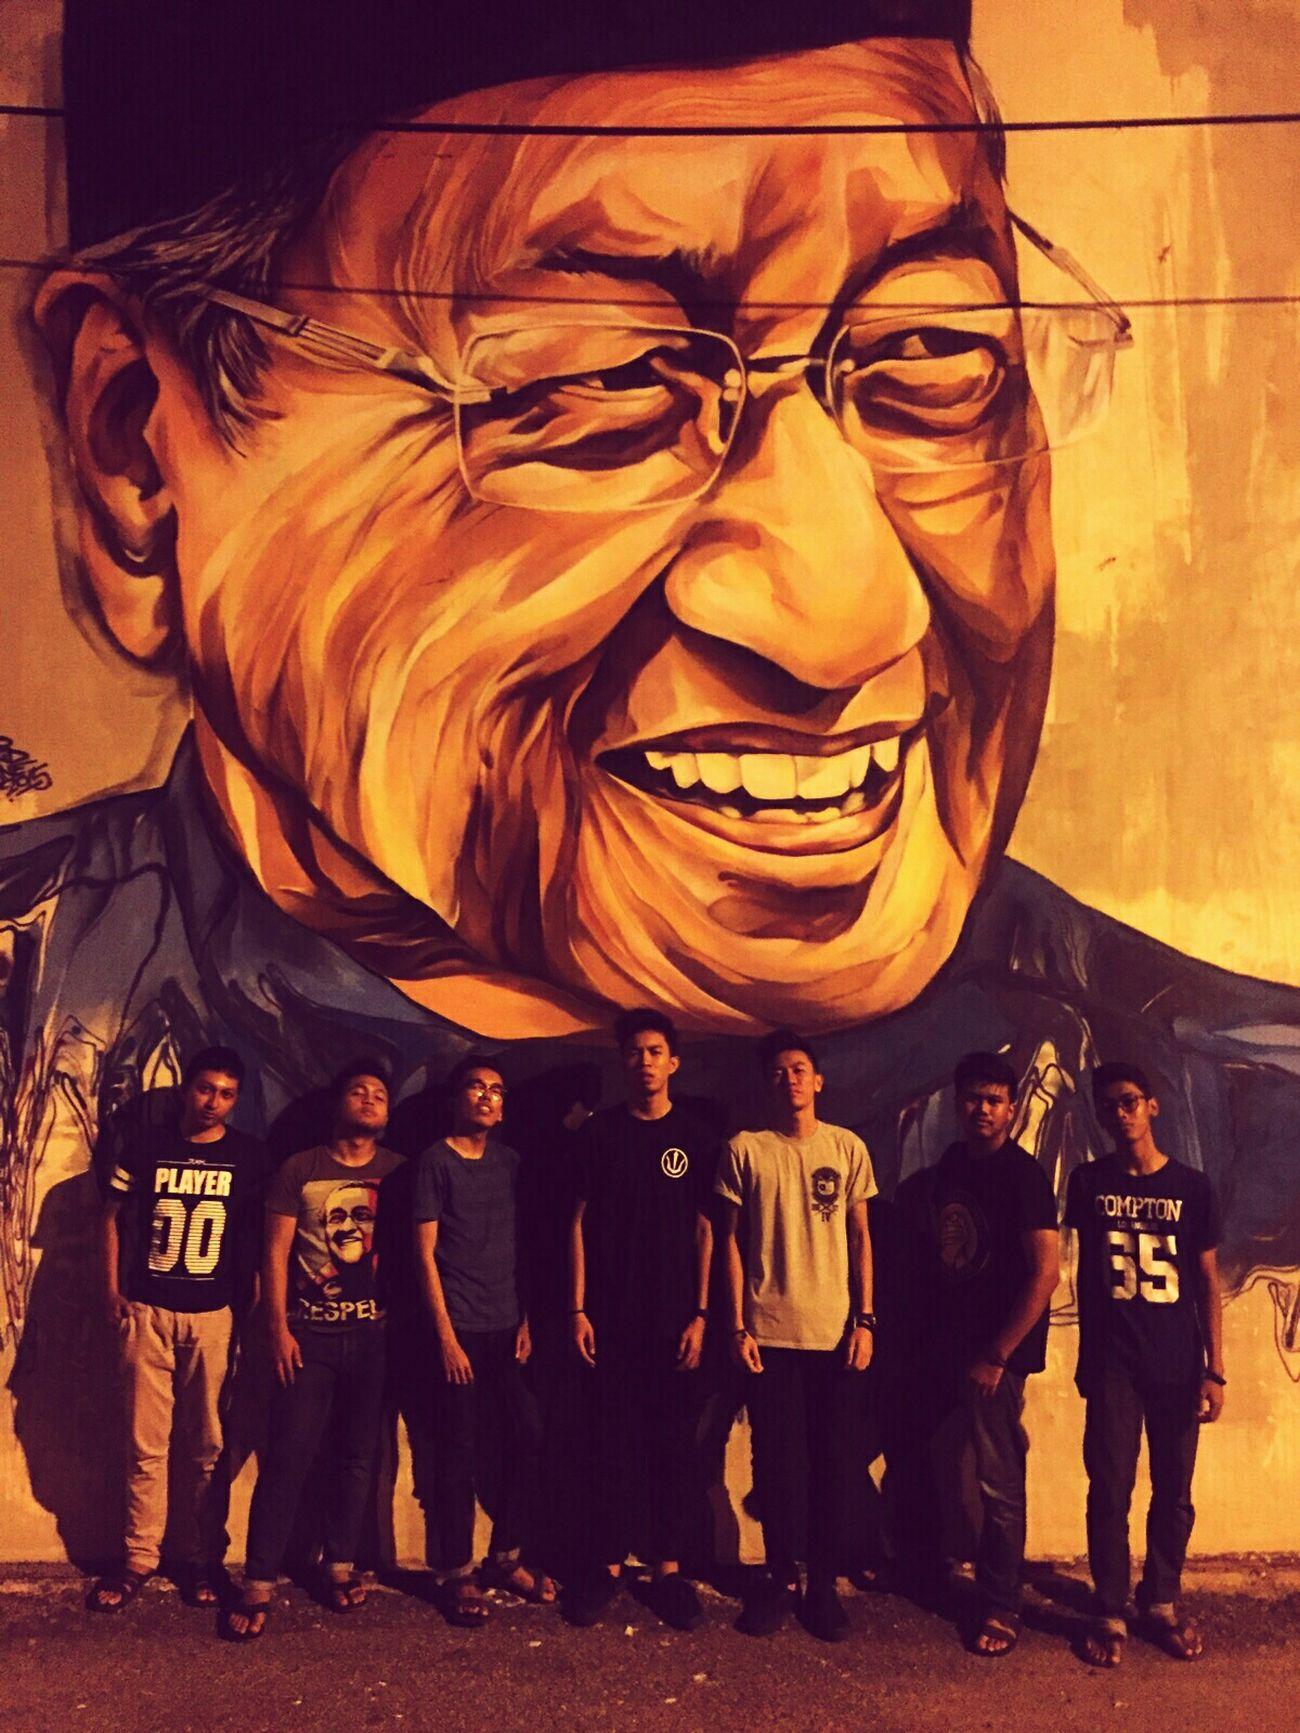 friends Streetart #street #streetphotography #tagsforlikes #sprayart #urban #urbanart #urbanwalls #wall #wallporn #graffitiigers #stencilart #art #graffiti #instagraffiti #instagood #artwork #mural #graffitiporn #photooftheday #stencil #streetartistry #photograp TunMahathir Lepaking Timahan